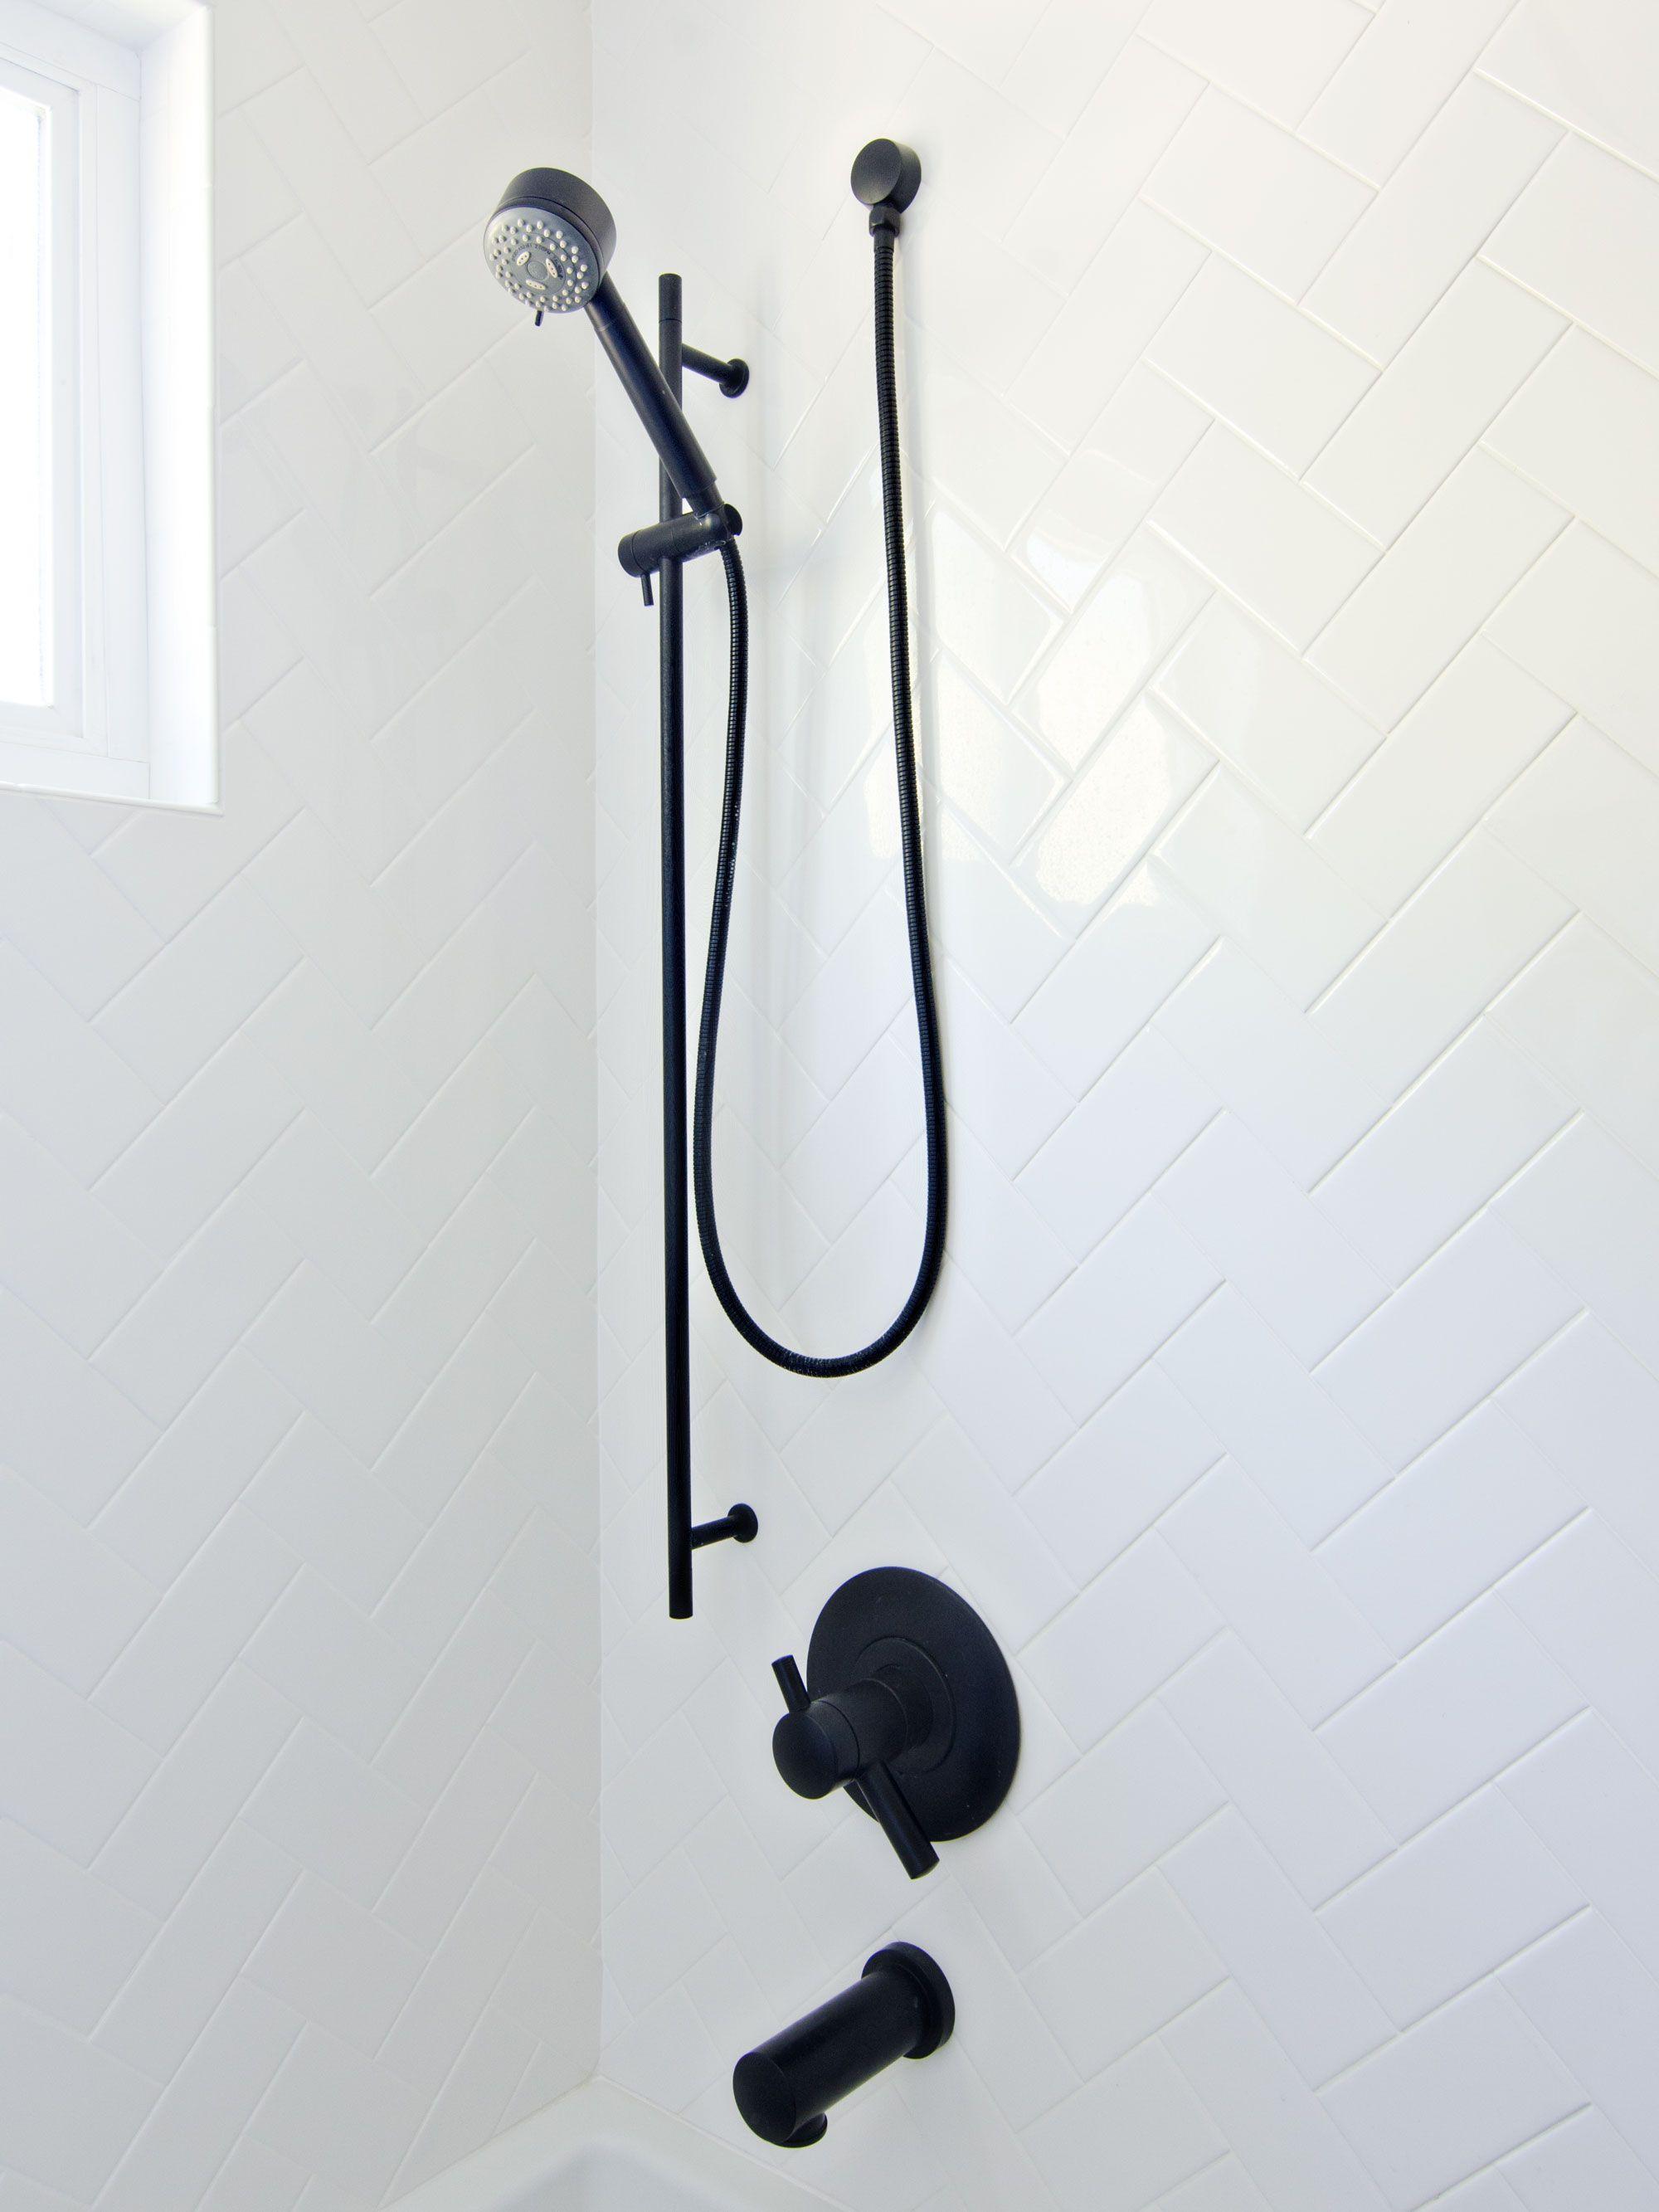 Matte black Jason Wu Brizo shower head & faucet   brittanyMakes ...